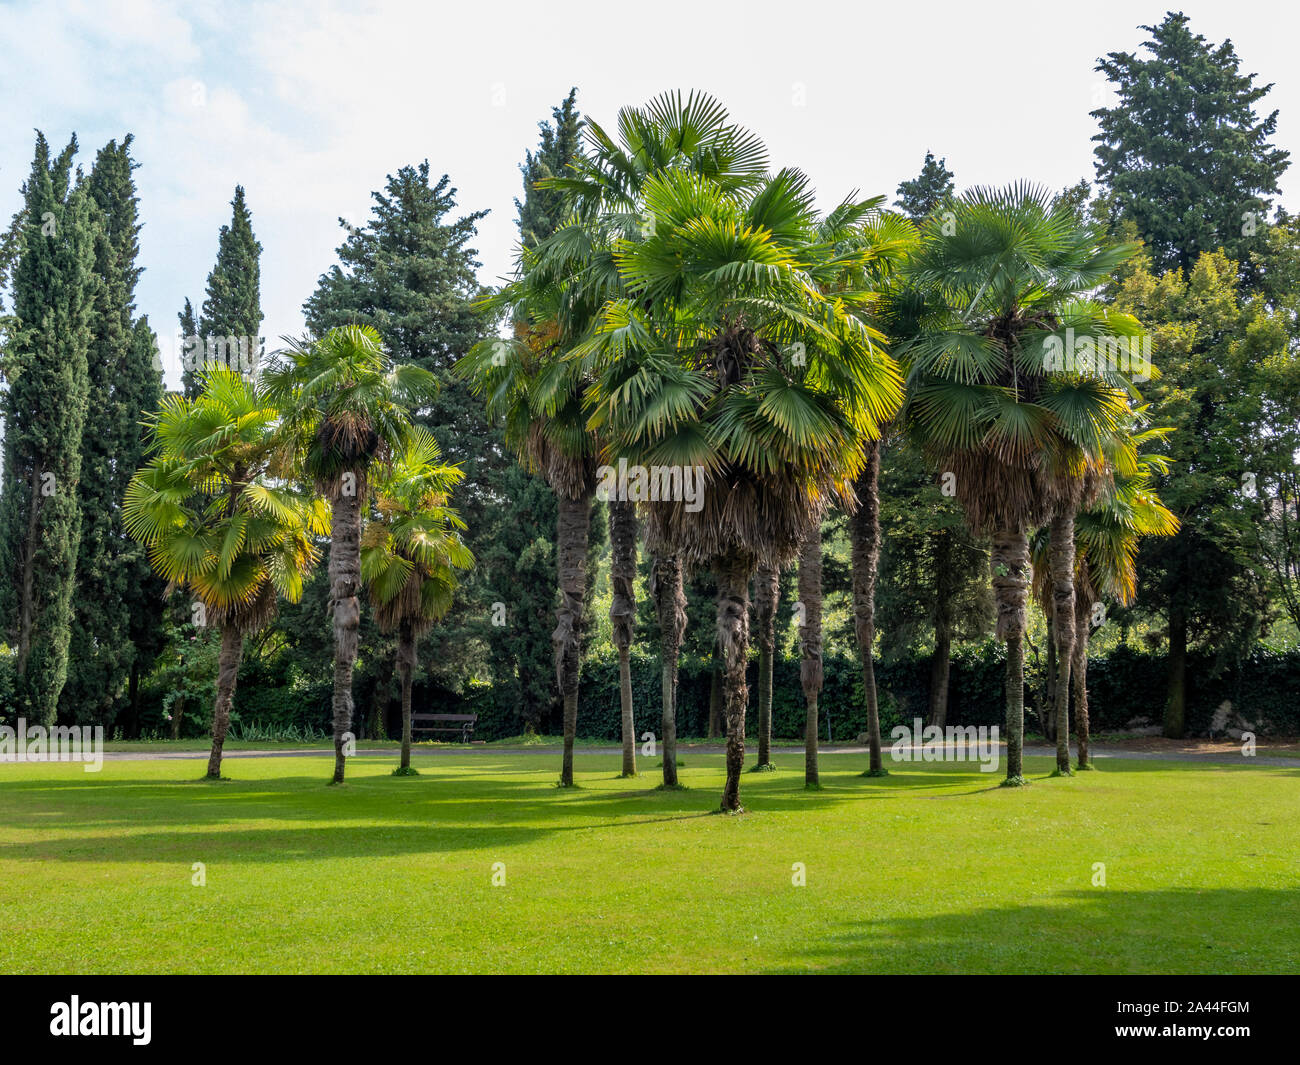 Park and Garden Sigurtá in Valeggio sul Mincio, Veneto, Italy Stock Photo